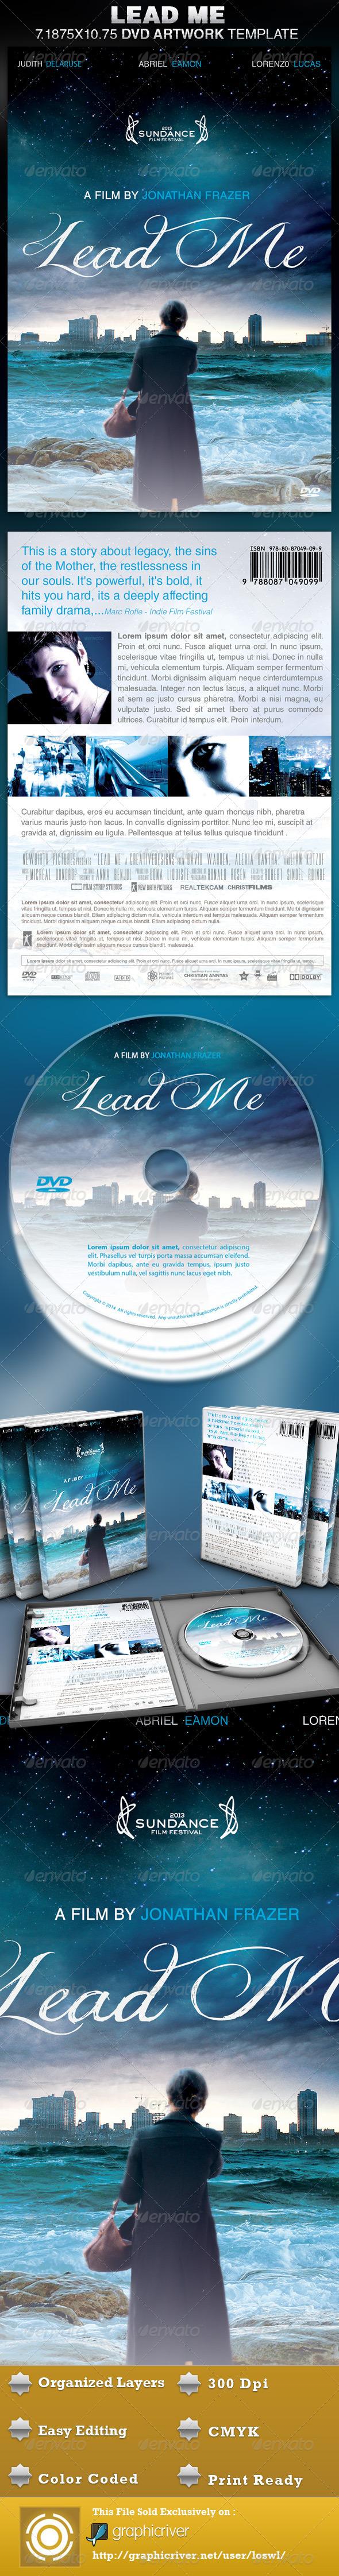 Lead Me DVD Artwork Template - CD & DVD Artwork Print Templates